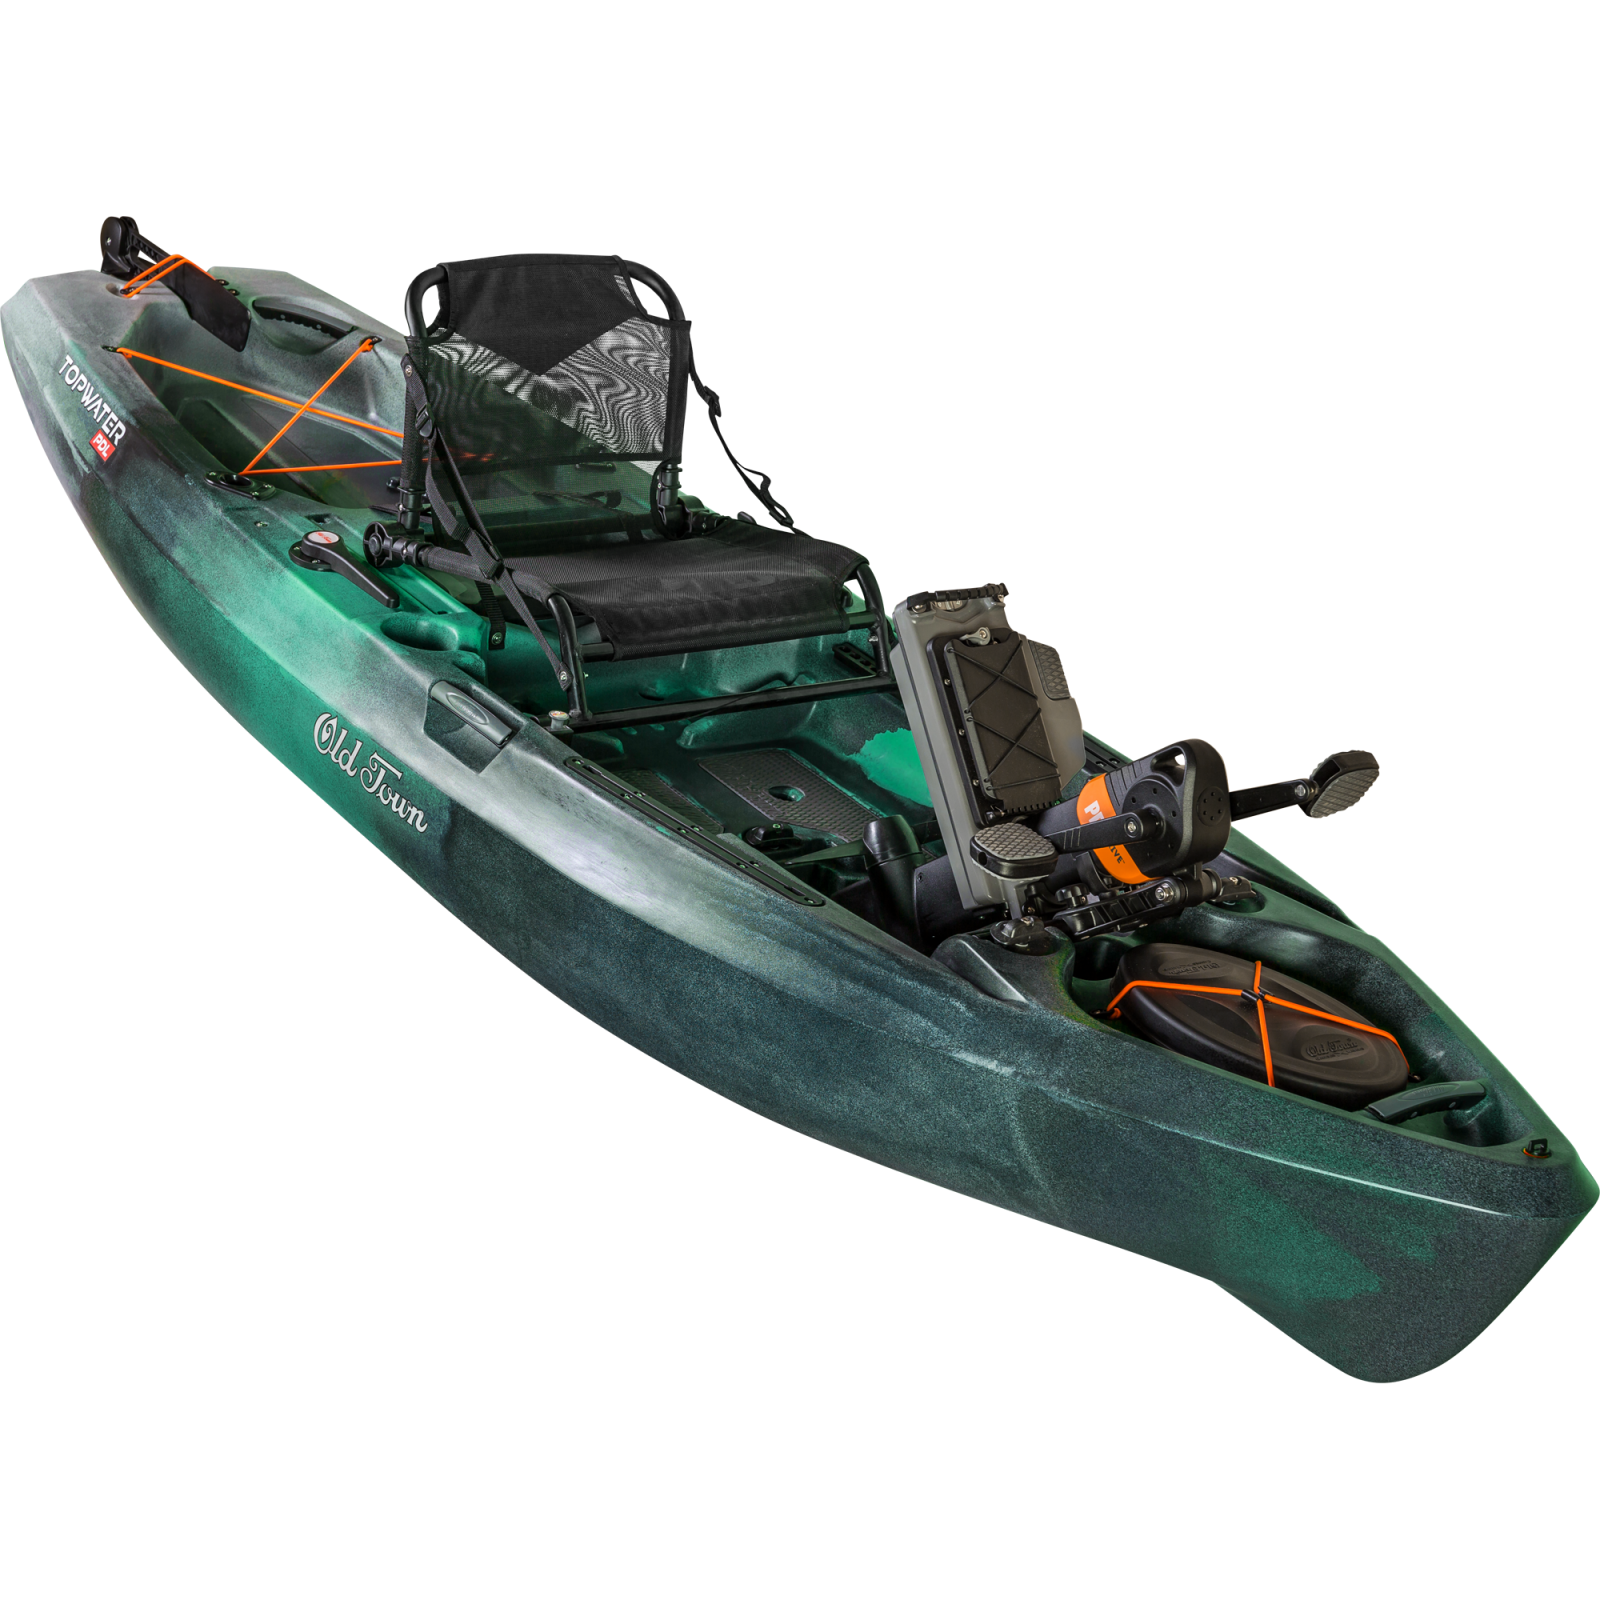 Topwater PDL 106 XTC19995E919